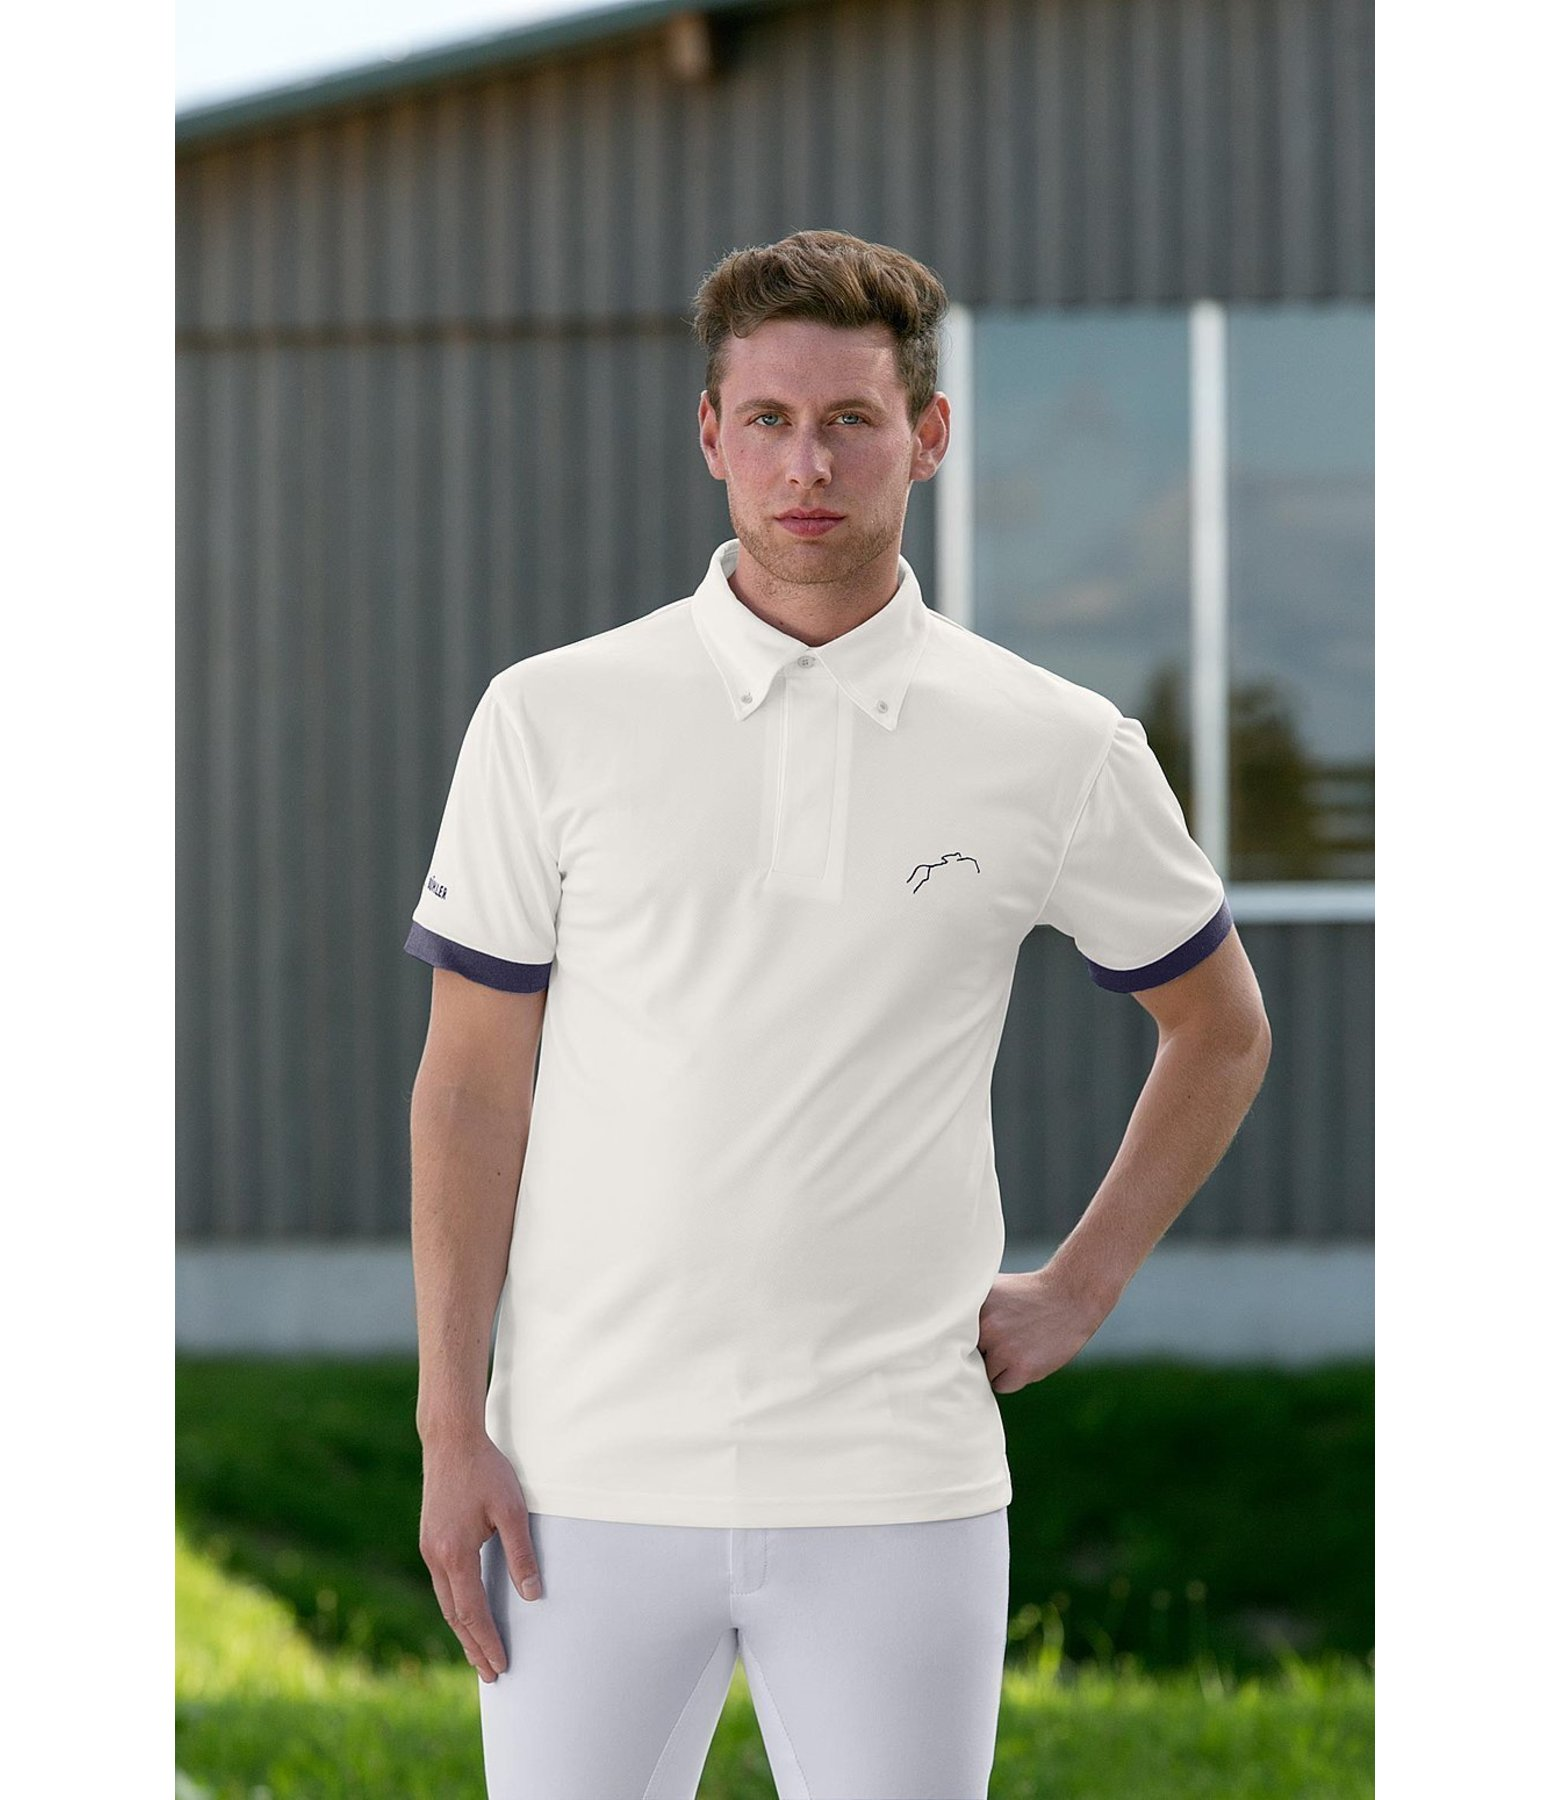 men 39 s functional competition shirt lyon men 39 s show wear. Black Bedroom Furniture Sets. Home Design Ideas